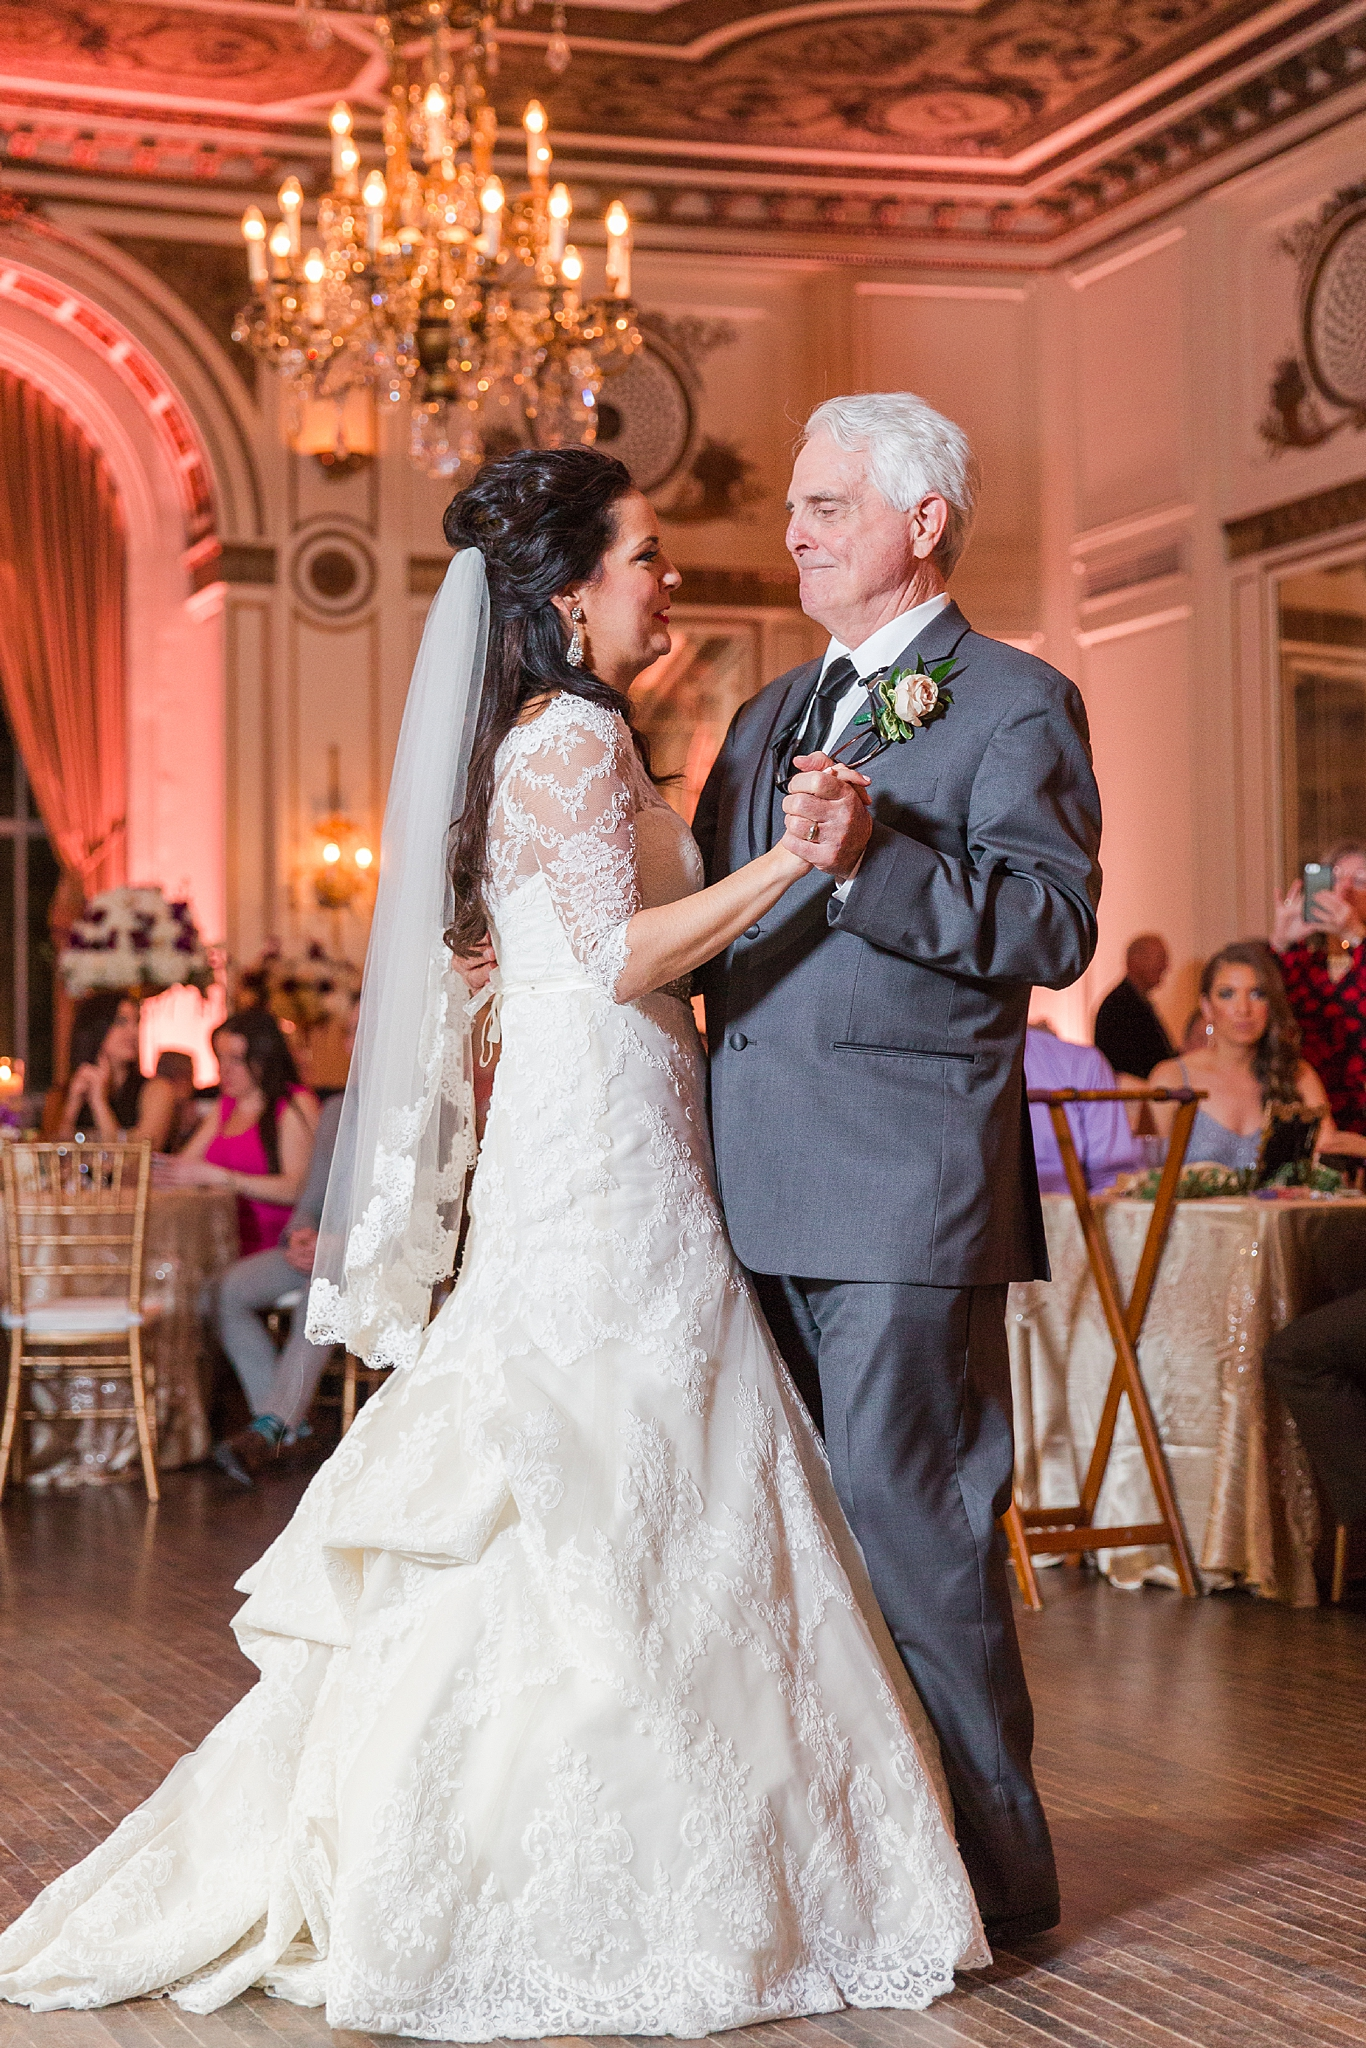 detroit-colony-club-wedding-regal-romantic-photography-in-detroit-mi-by-courtney-carolyn-photography_0043.jpg